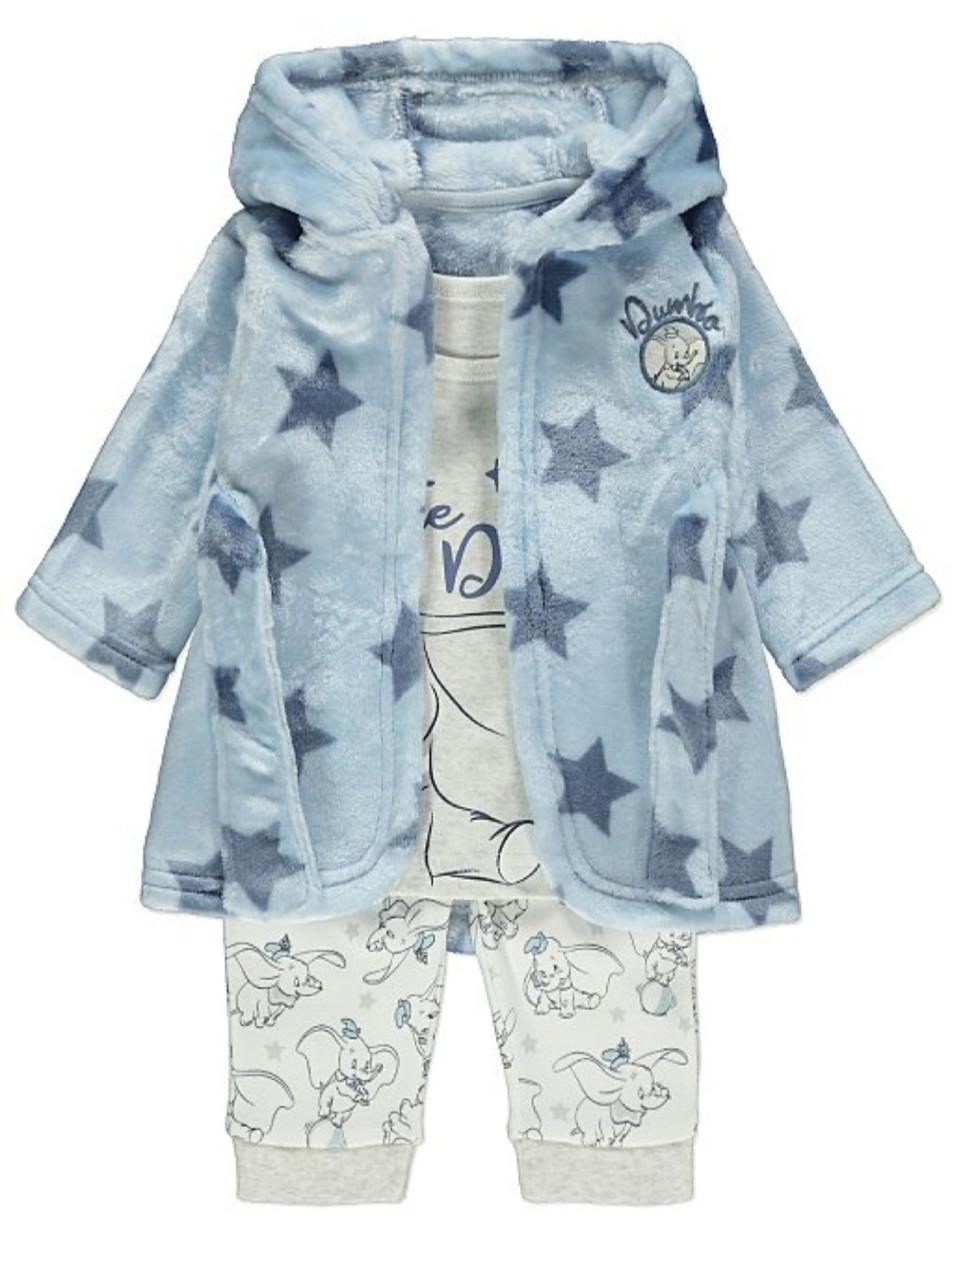 Набор детский халат и пижама George (Англия) р.86см (12-18мес.)